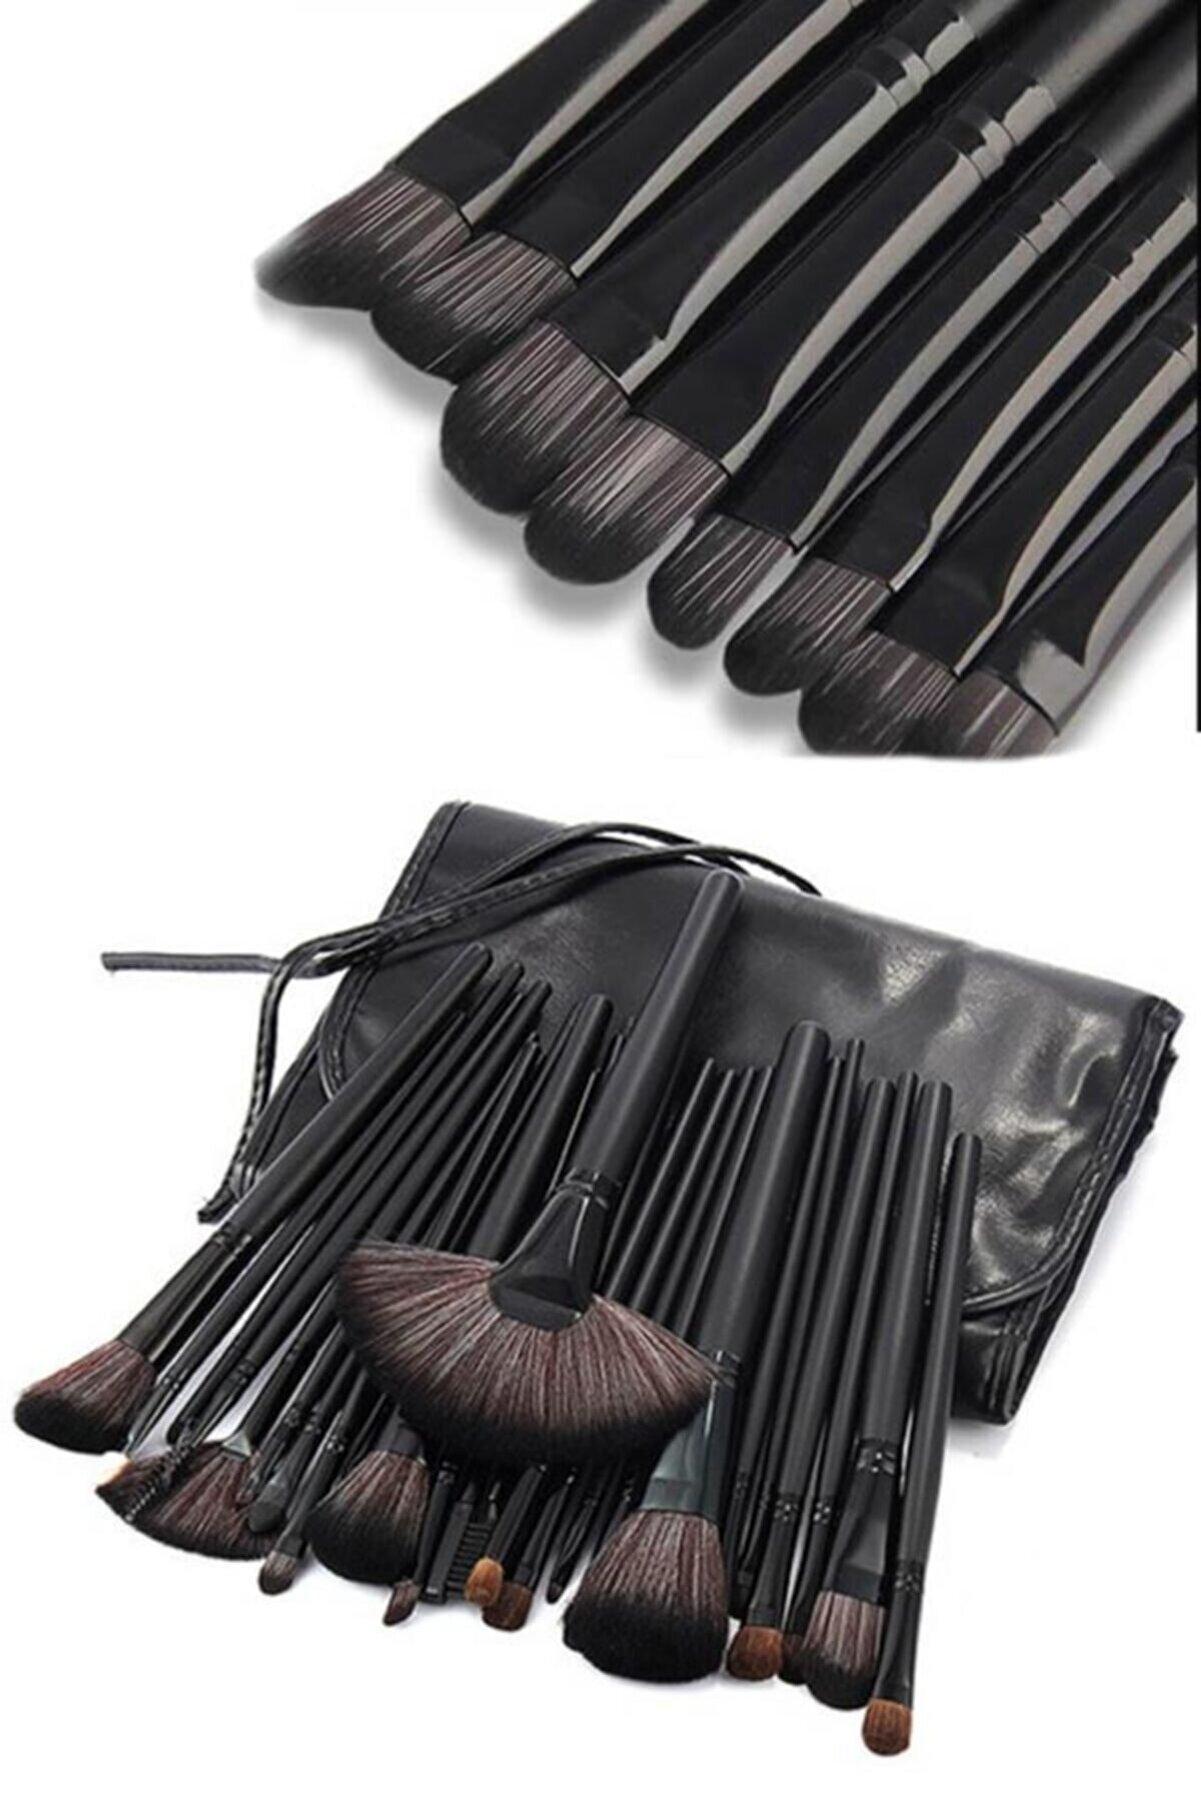 MUJGAN 24'lü Profesyonel Makyaj Fırça Seti Siyah Renk